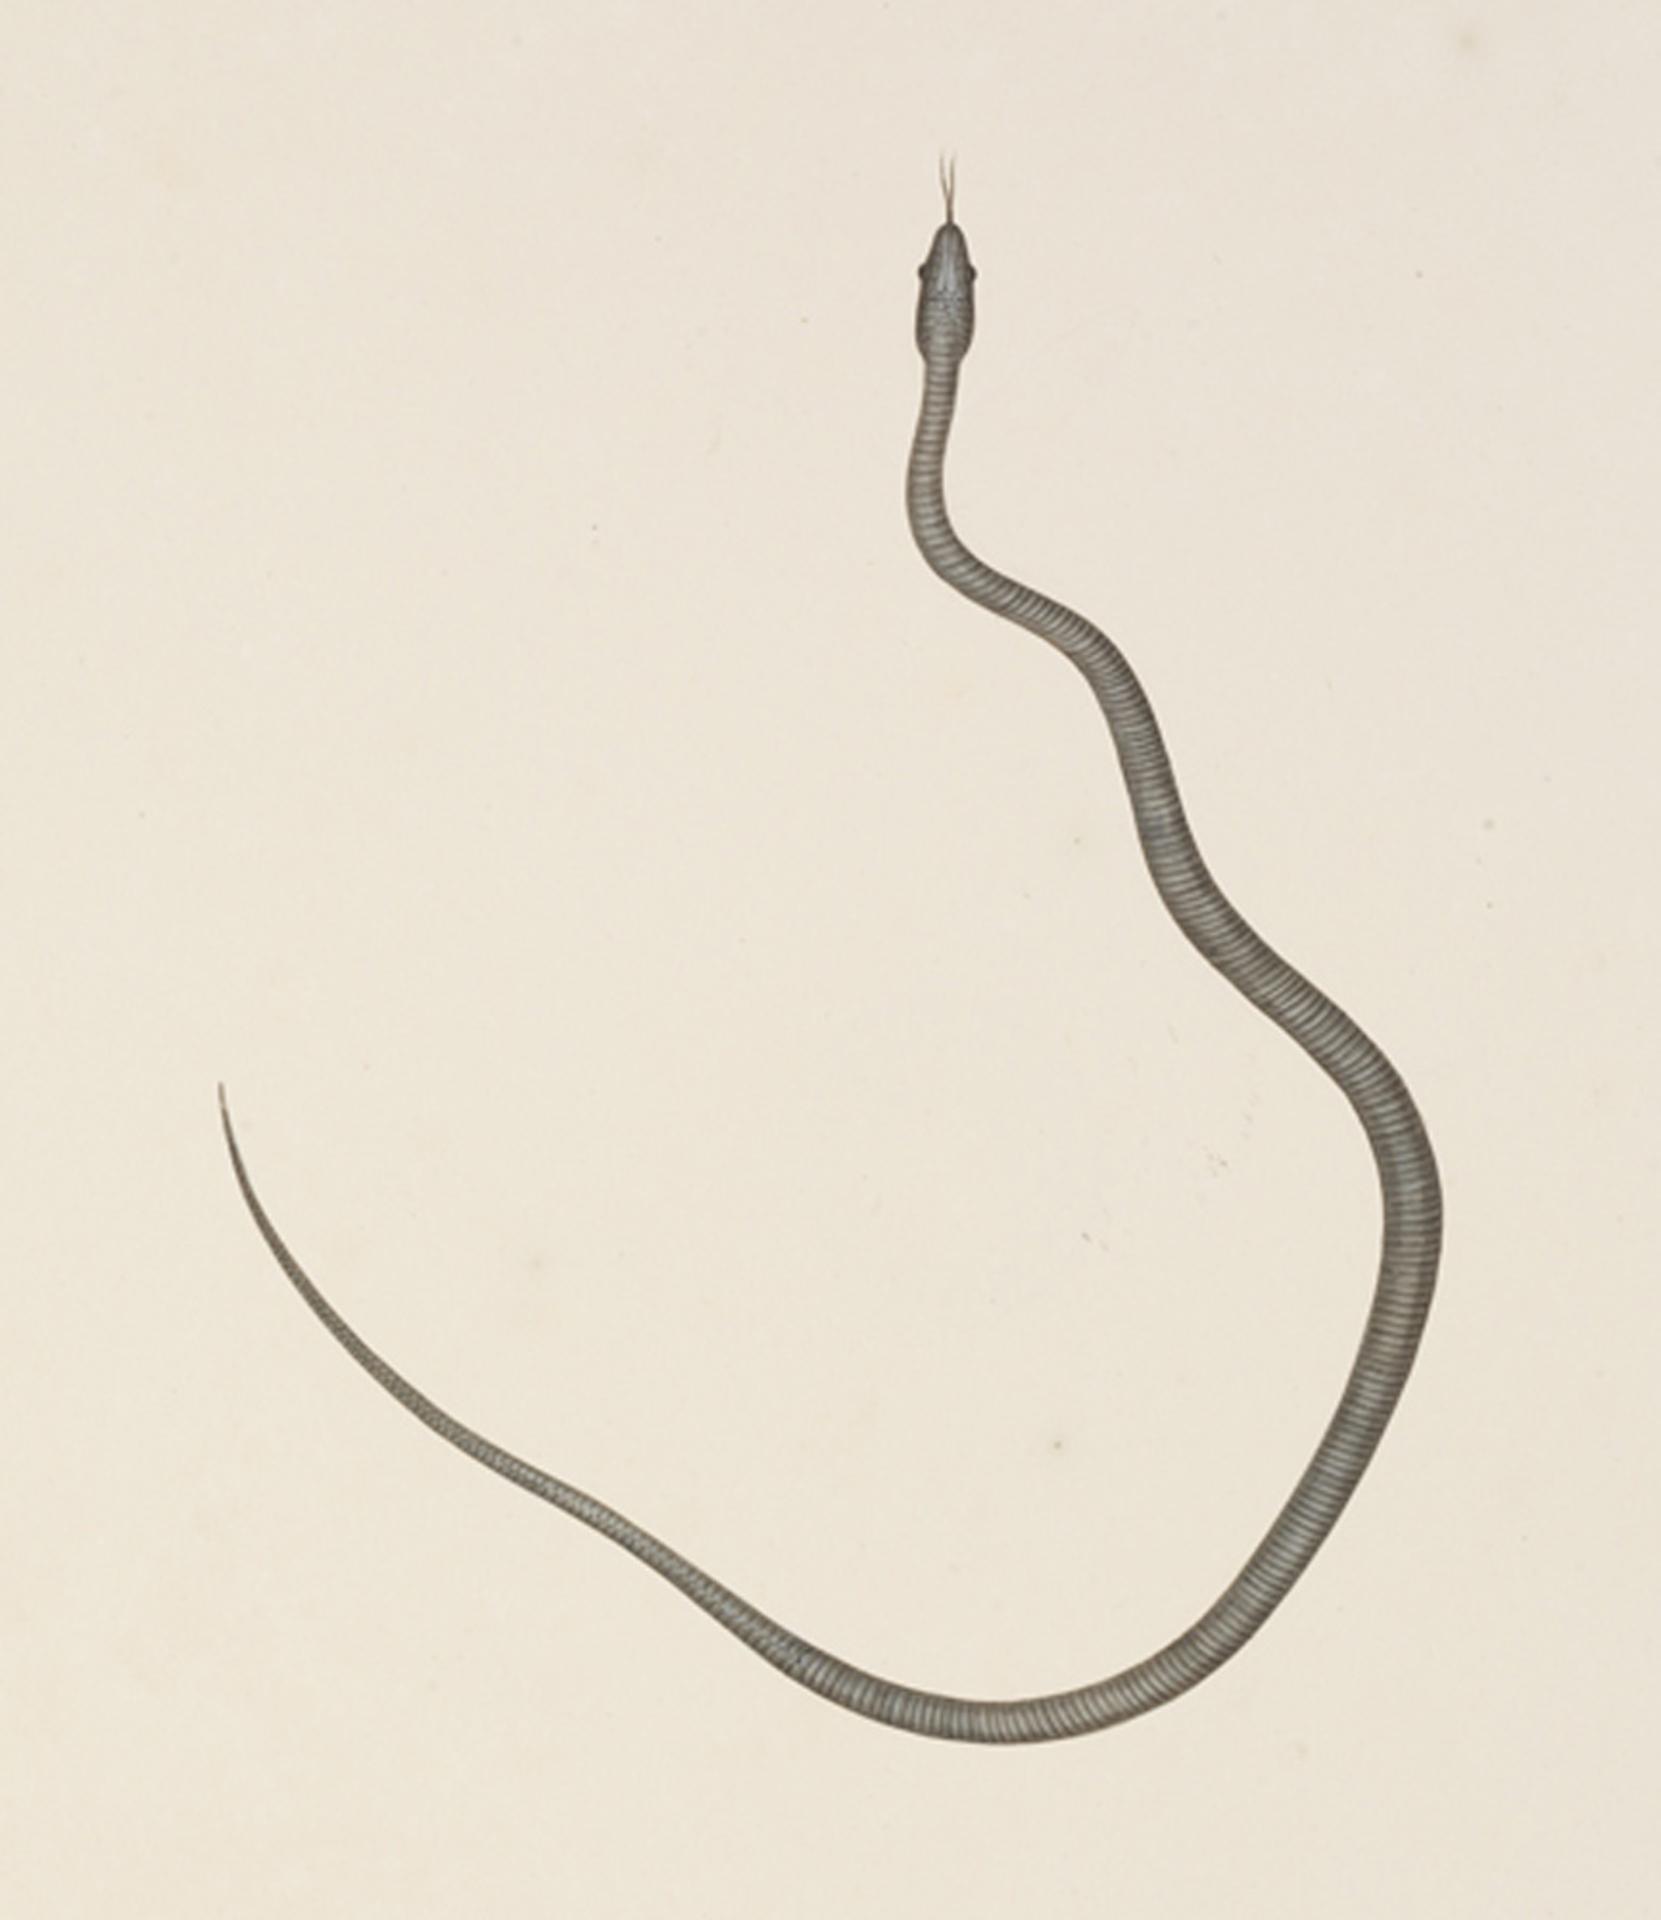 RMNH.ART.118 | Elaphe quadrivirgata